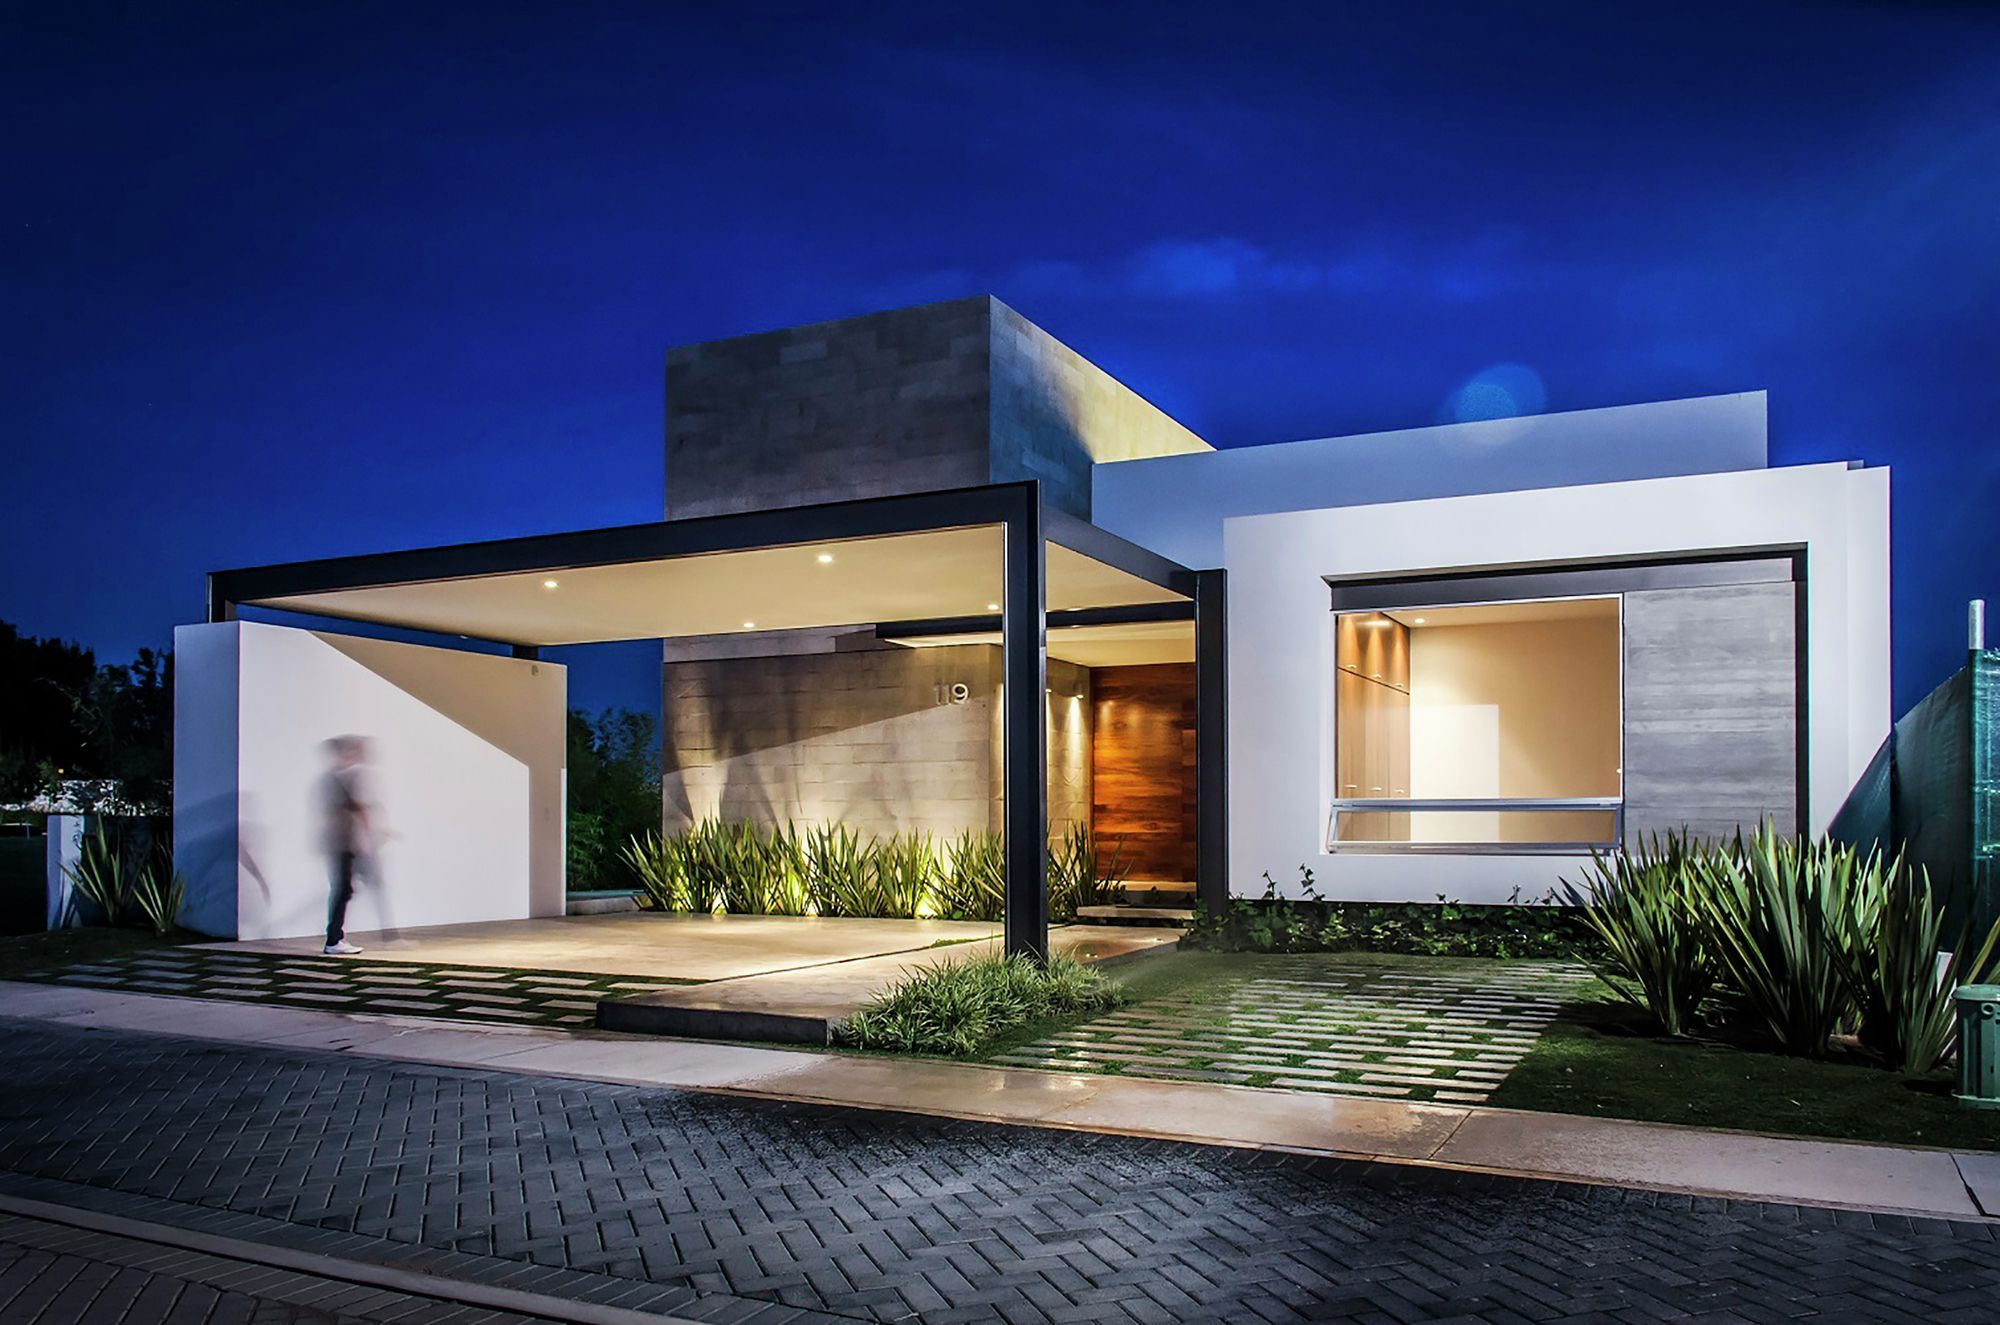 dise o de casa moderna de un piso con tres dormitorios On casa de diseno eesuuuuy